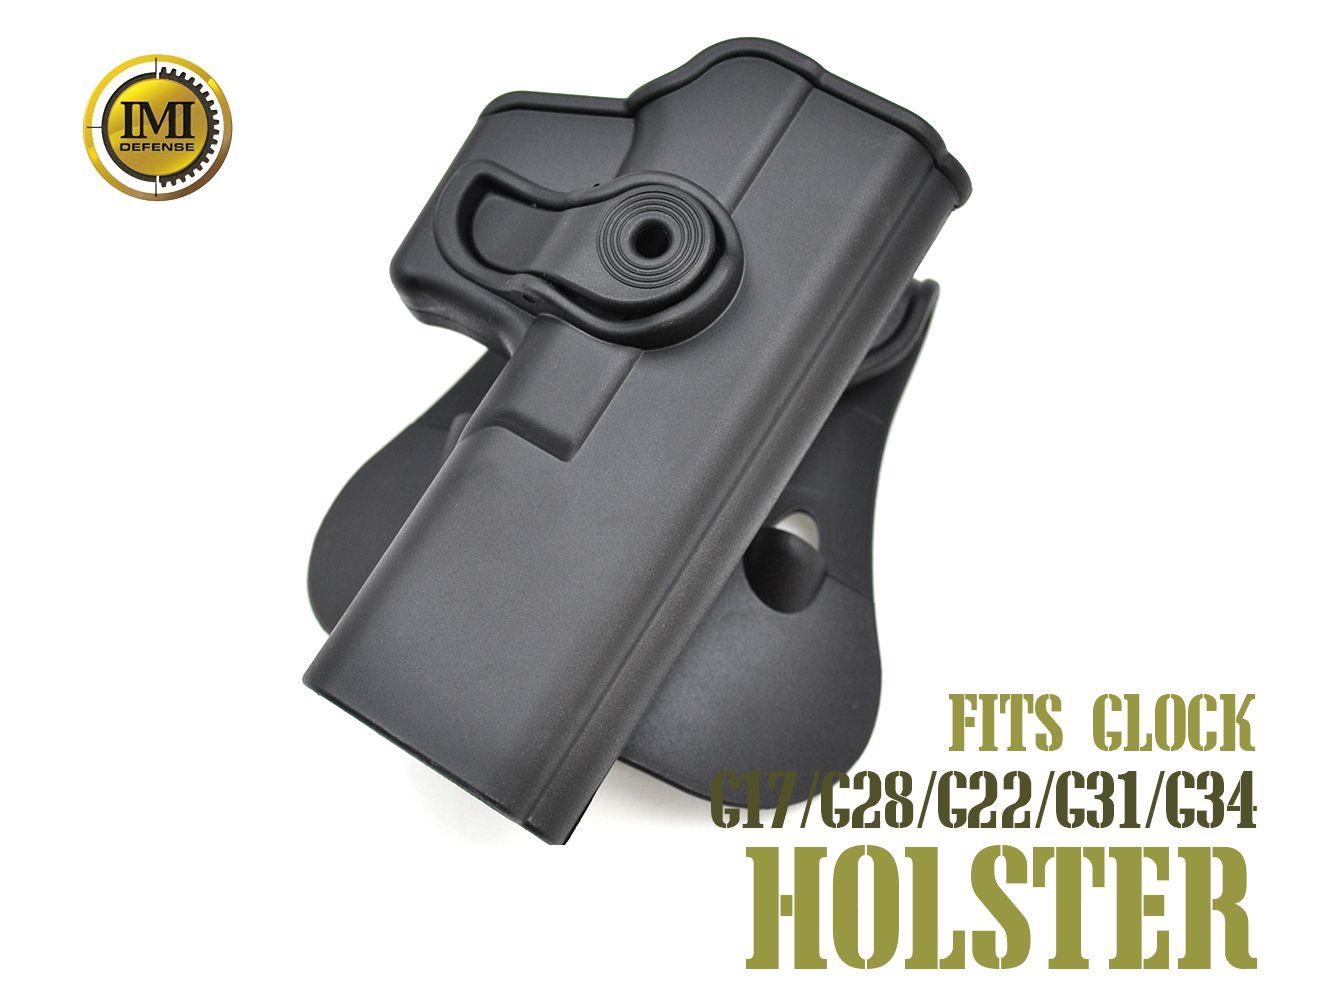 IMI DEFENSE パドルホルスター for G17/G28/G22/G31/G34 右用 BK★G17 G28 G22 G31 G34 右用 ライトハンド 右利き